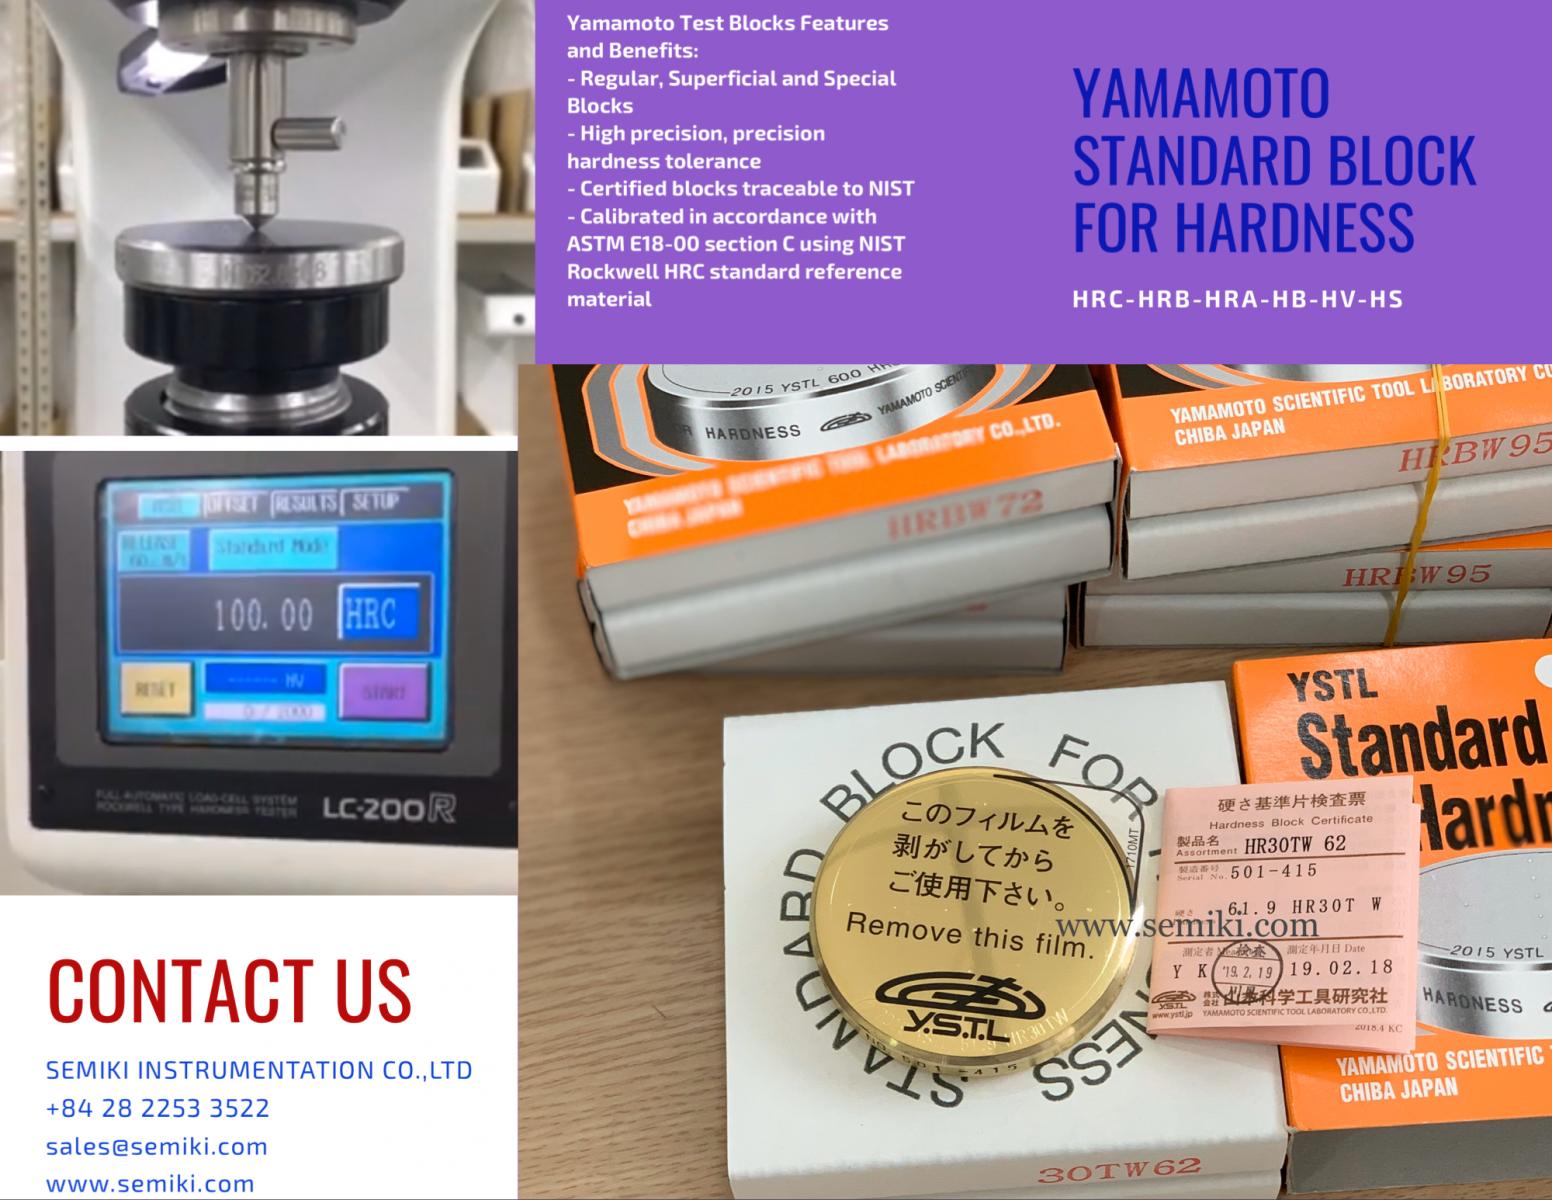 yamamoto standard block for hardness